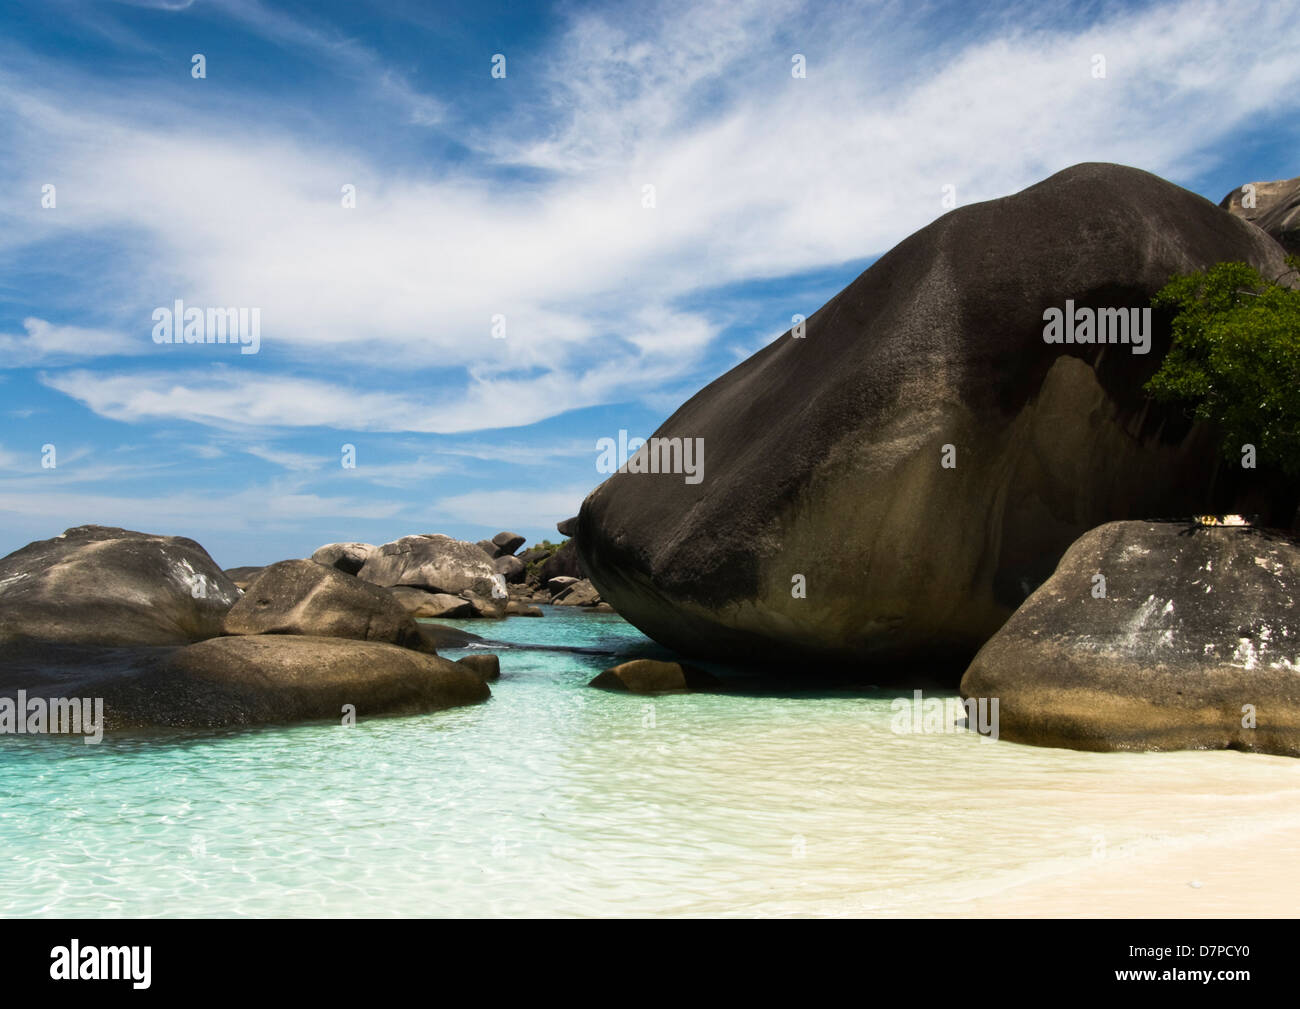 Koh Payu Island, Mu Ko Similian Marine National Park, Andamanensee - Stock Image